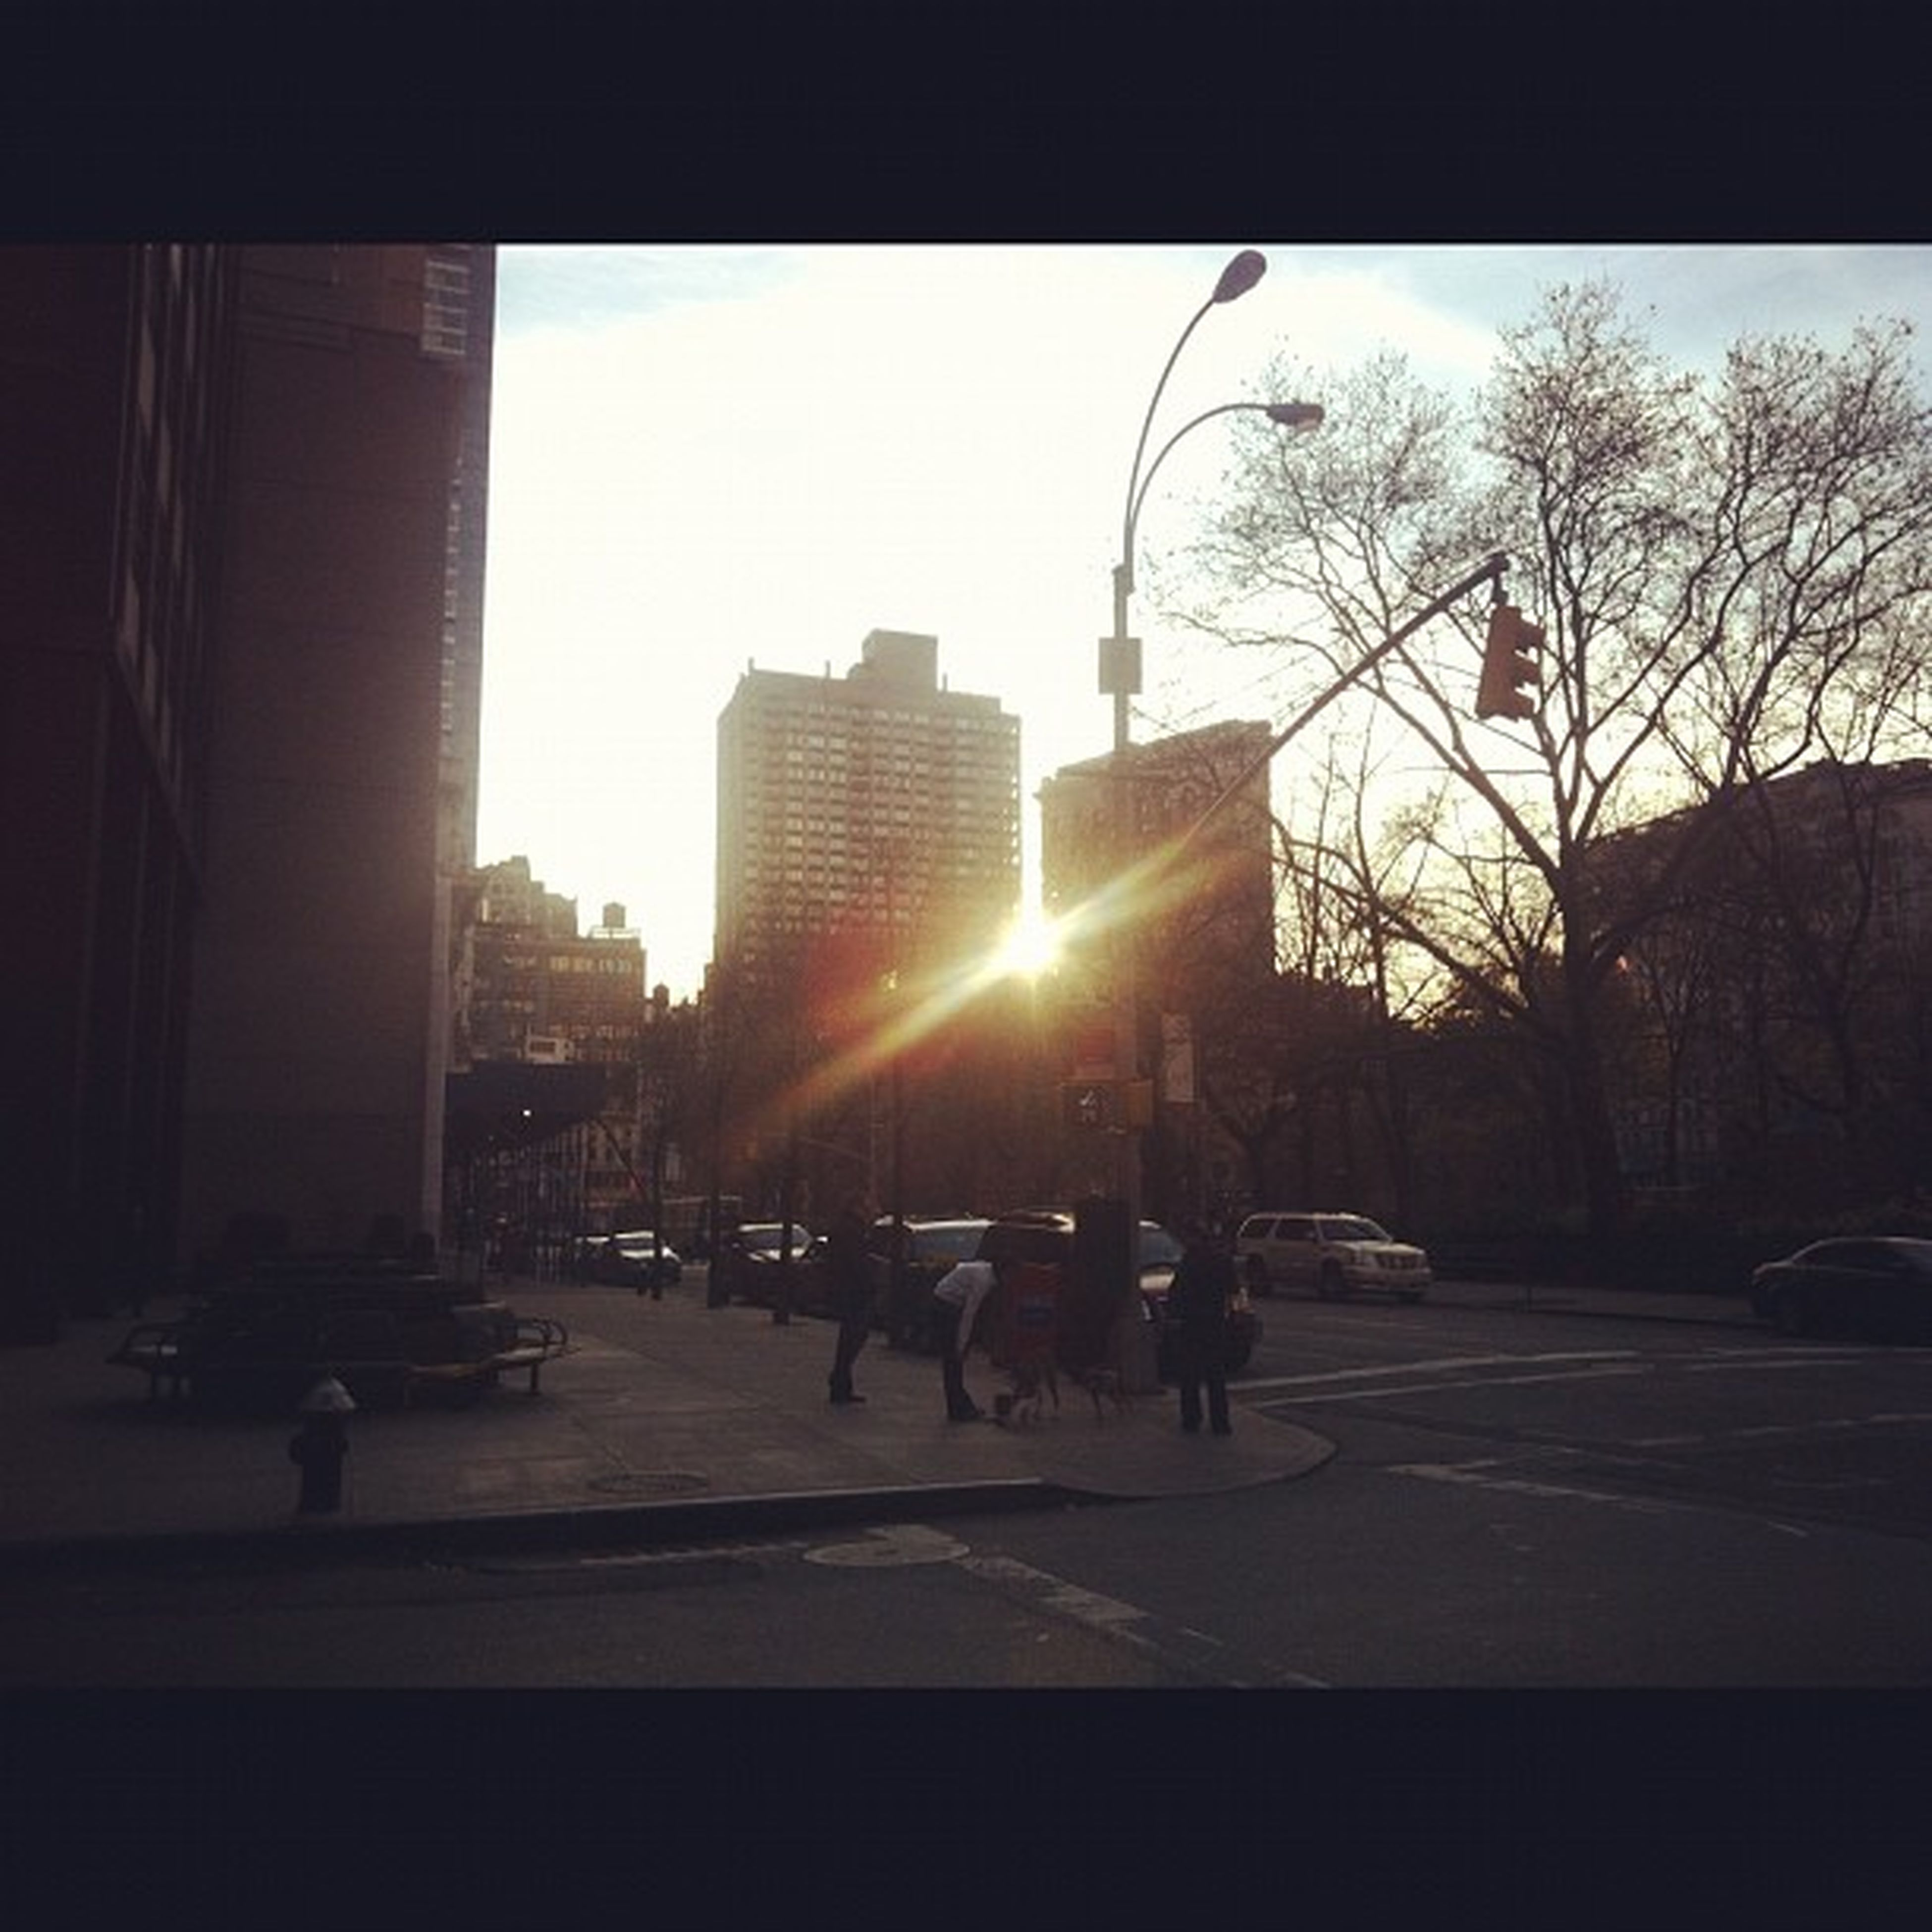 building exterior, architecture, built structure, street, transportation, sun, car, land vehicle, city, sunlight, road, silhouette, bare tree, mode of transport, sunbeam, clear sky, sunset, lens flare, city street